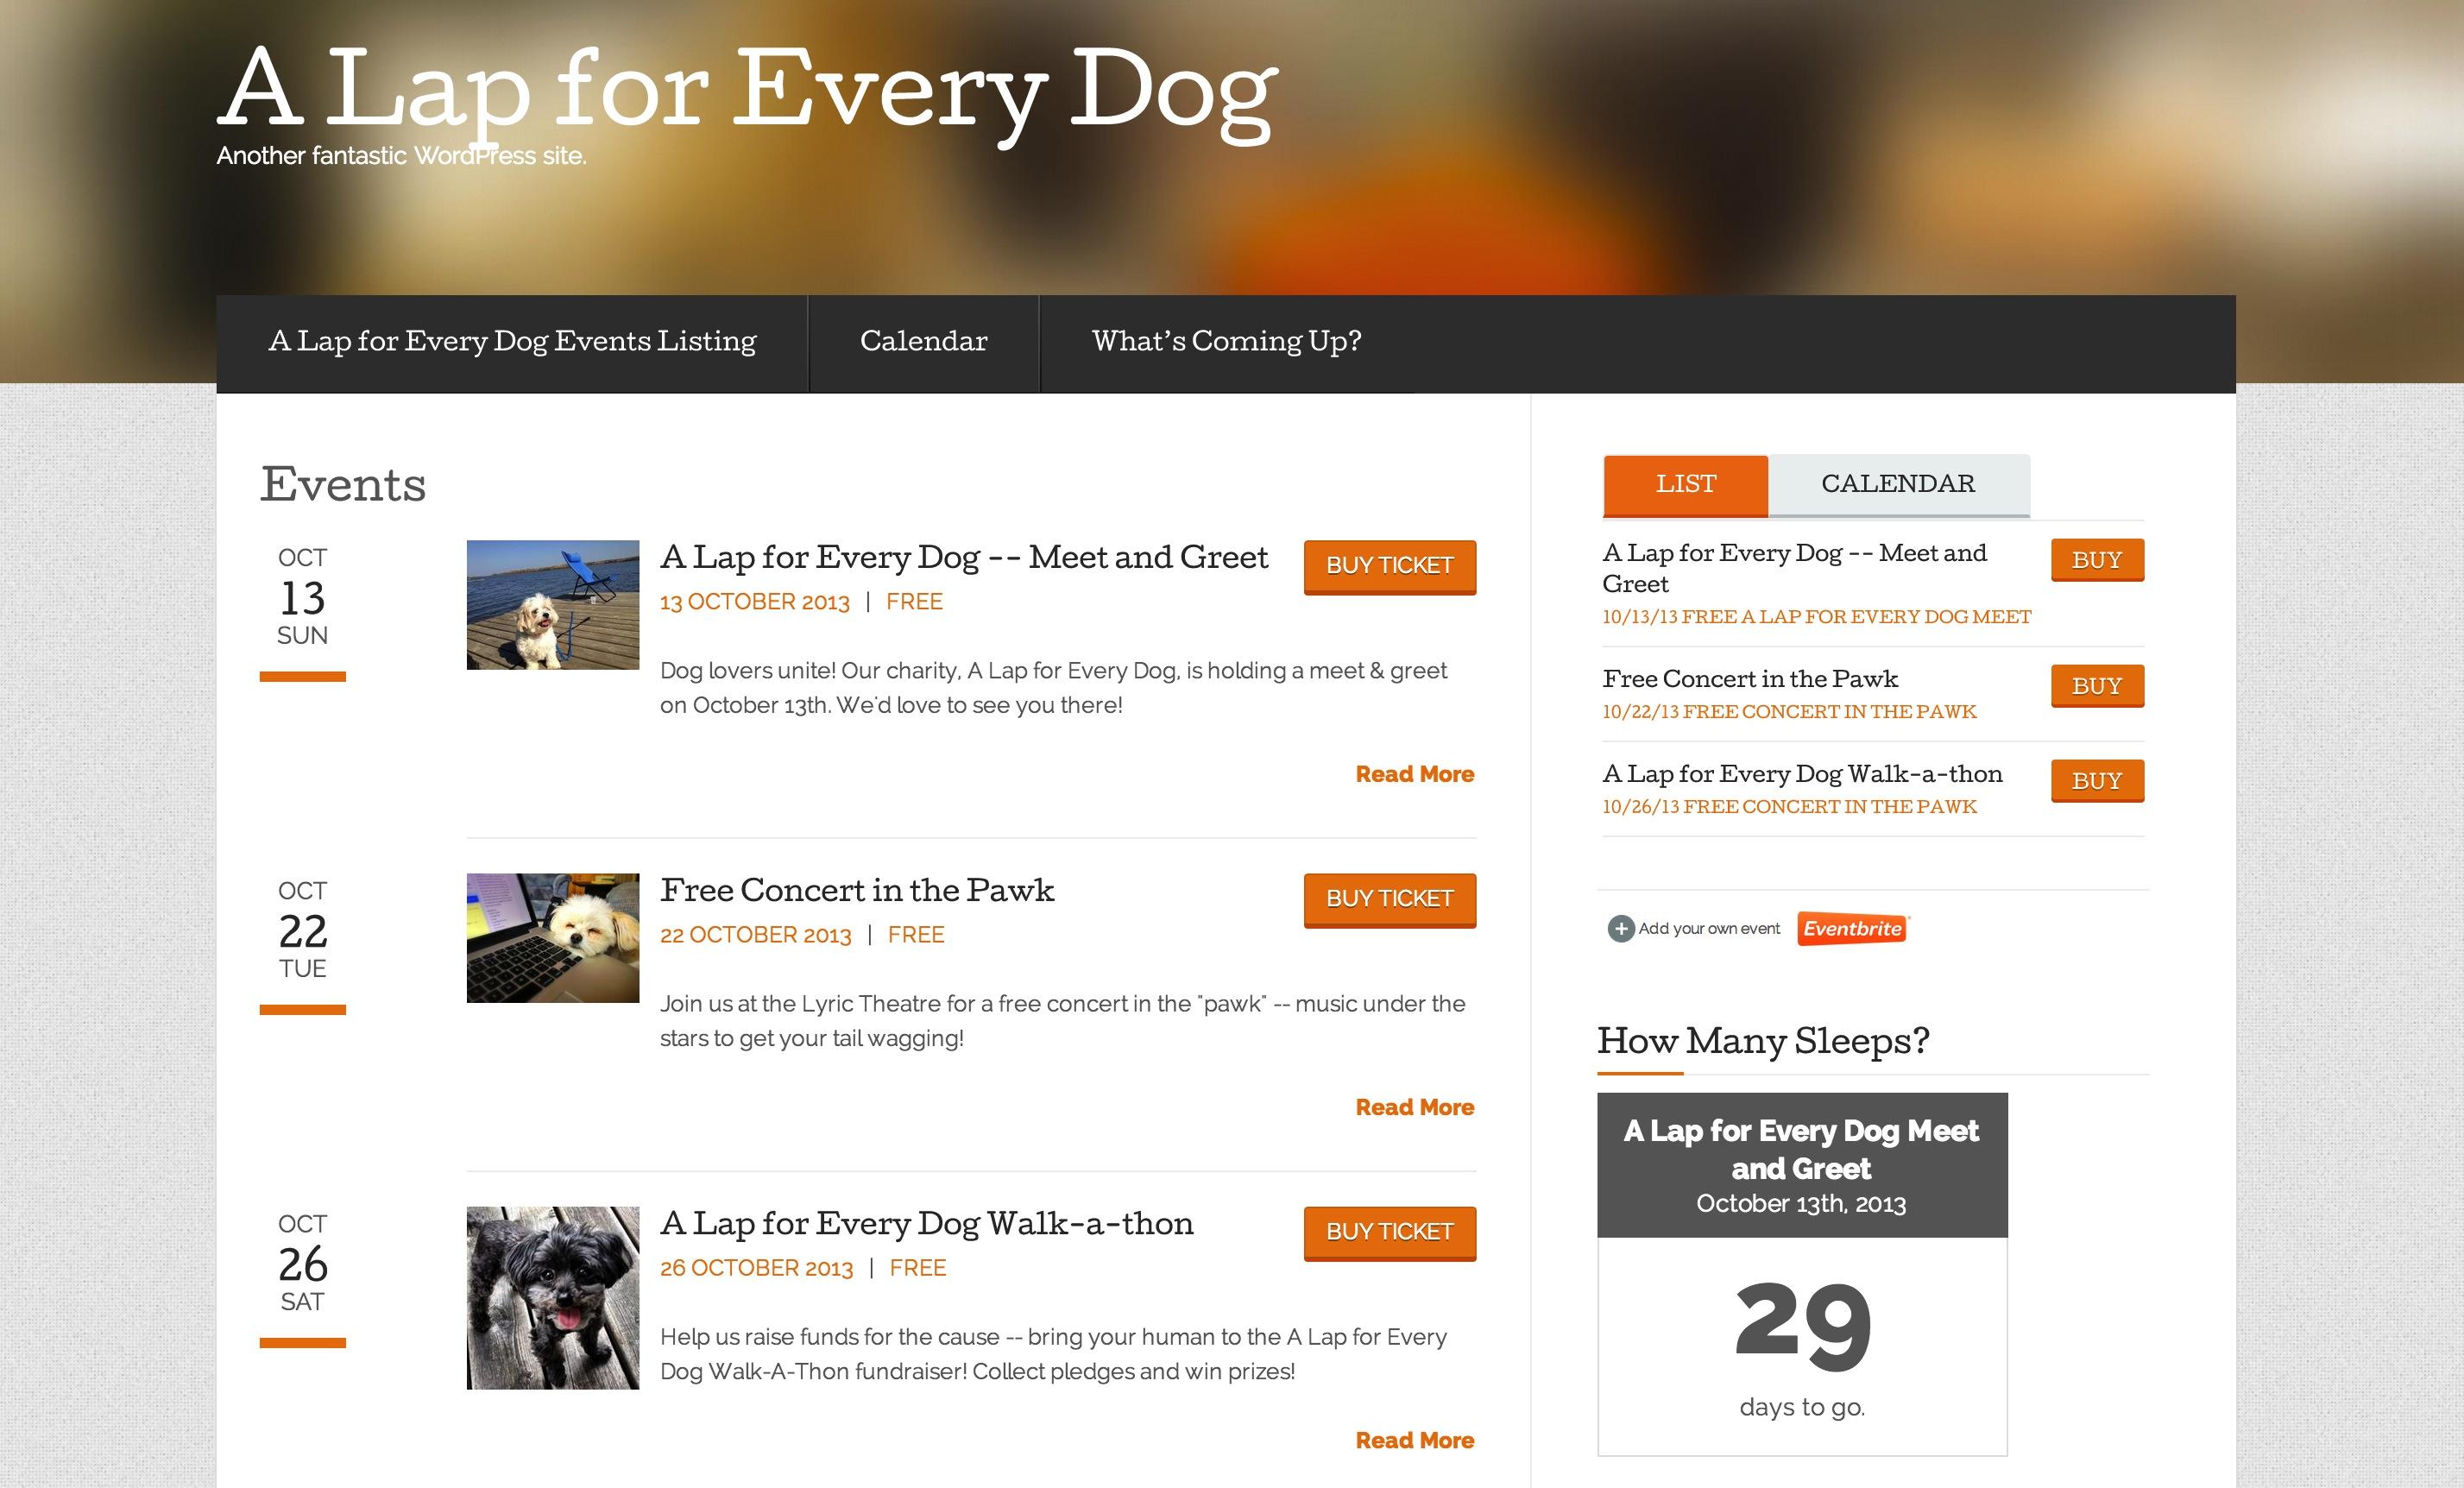 eventslistingpage